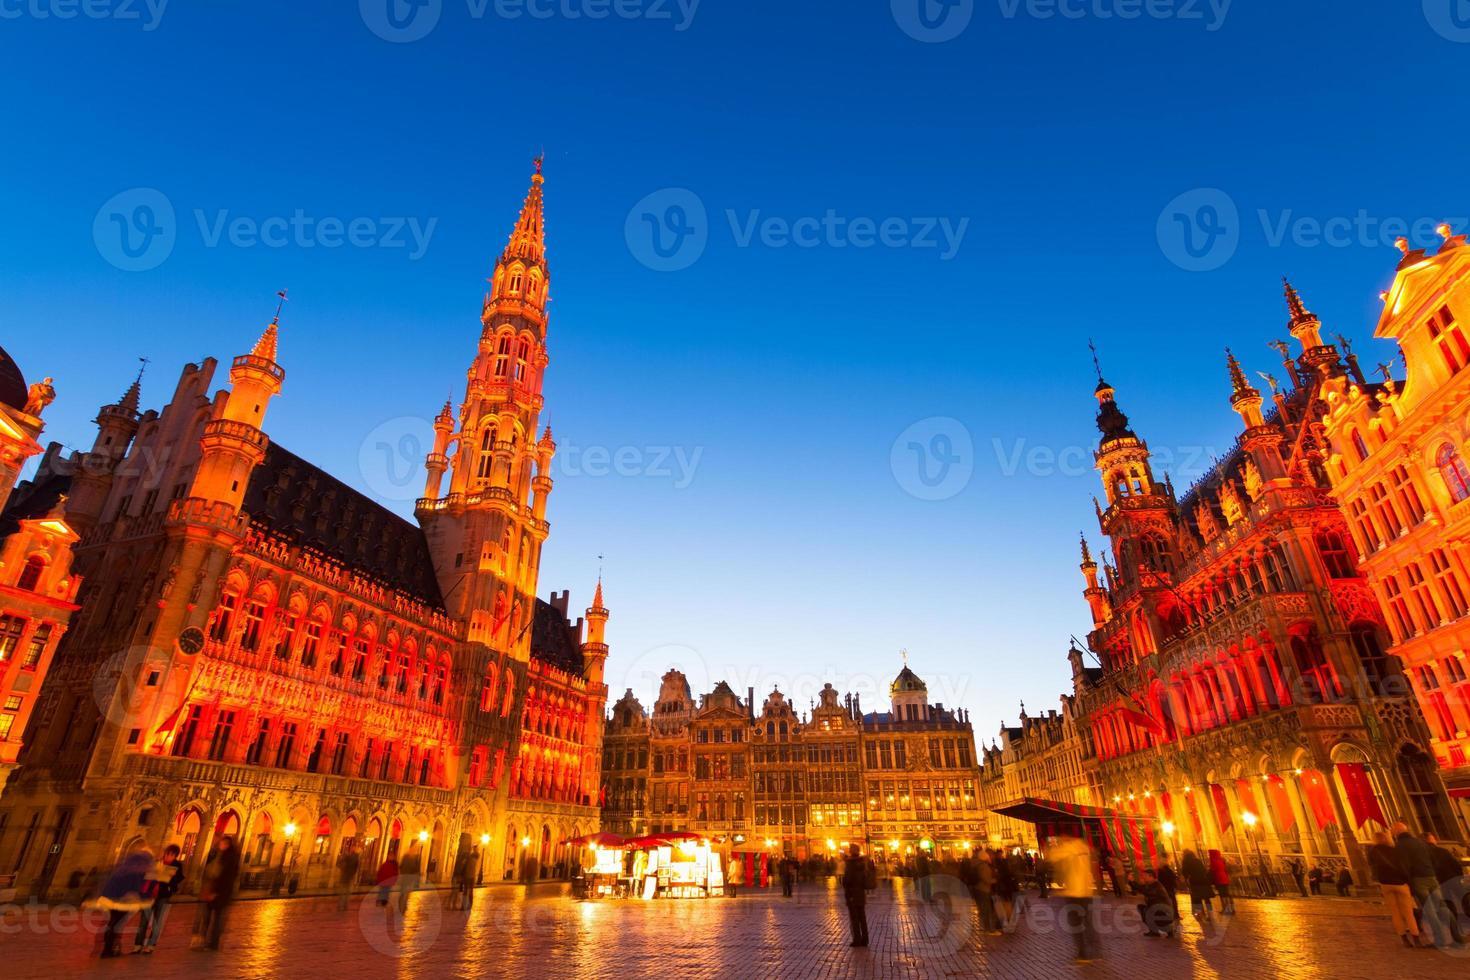 grote markt, bruxelas, bélgica, europa. foto